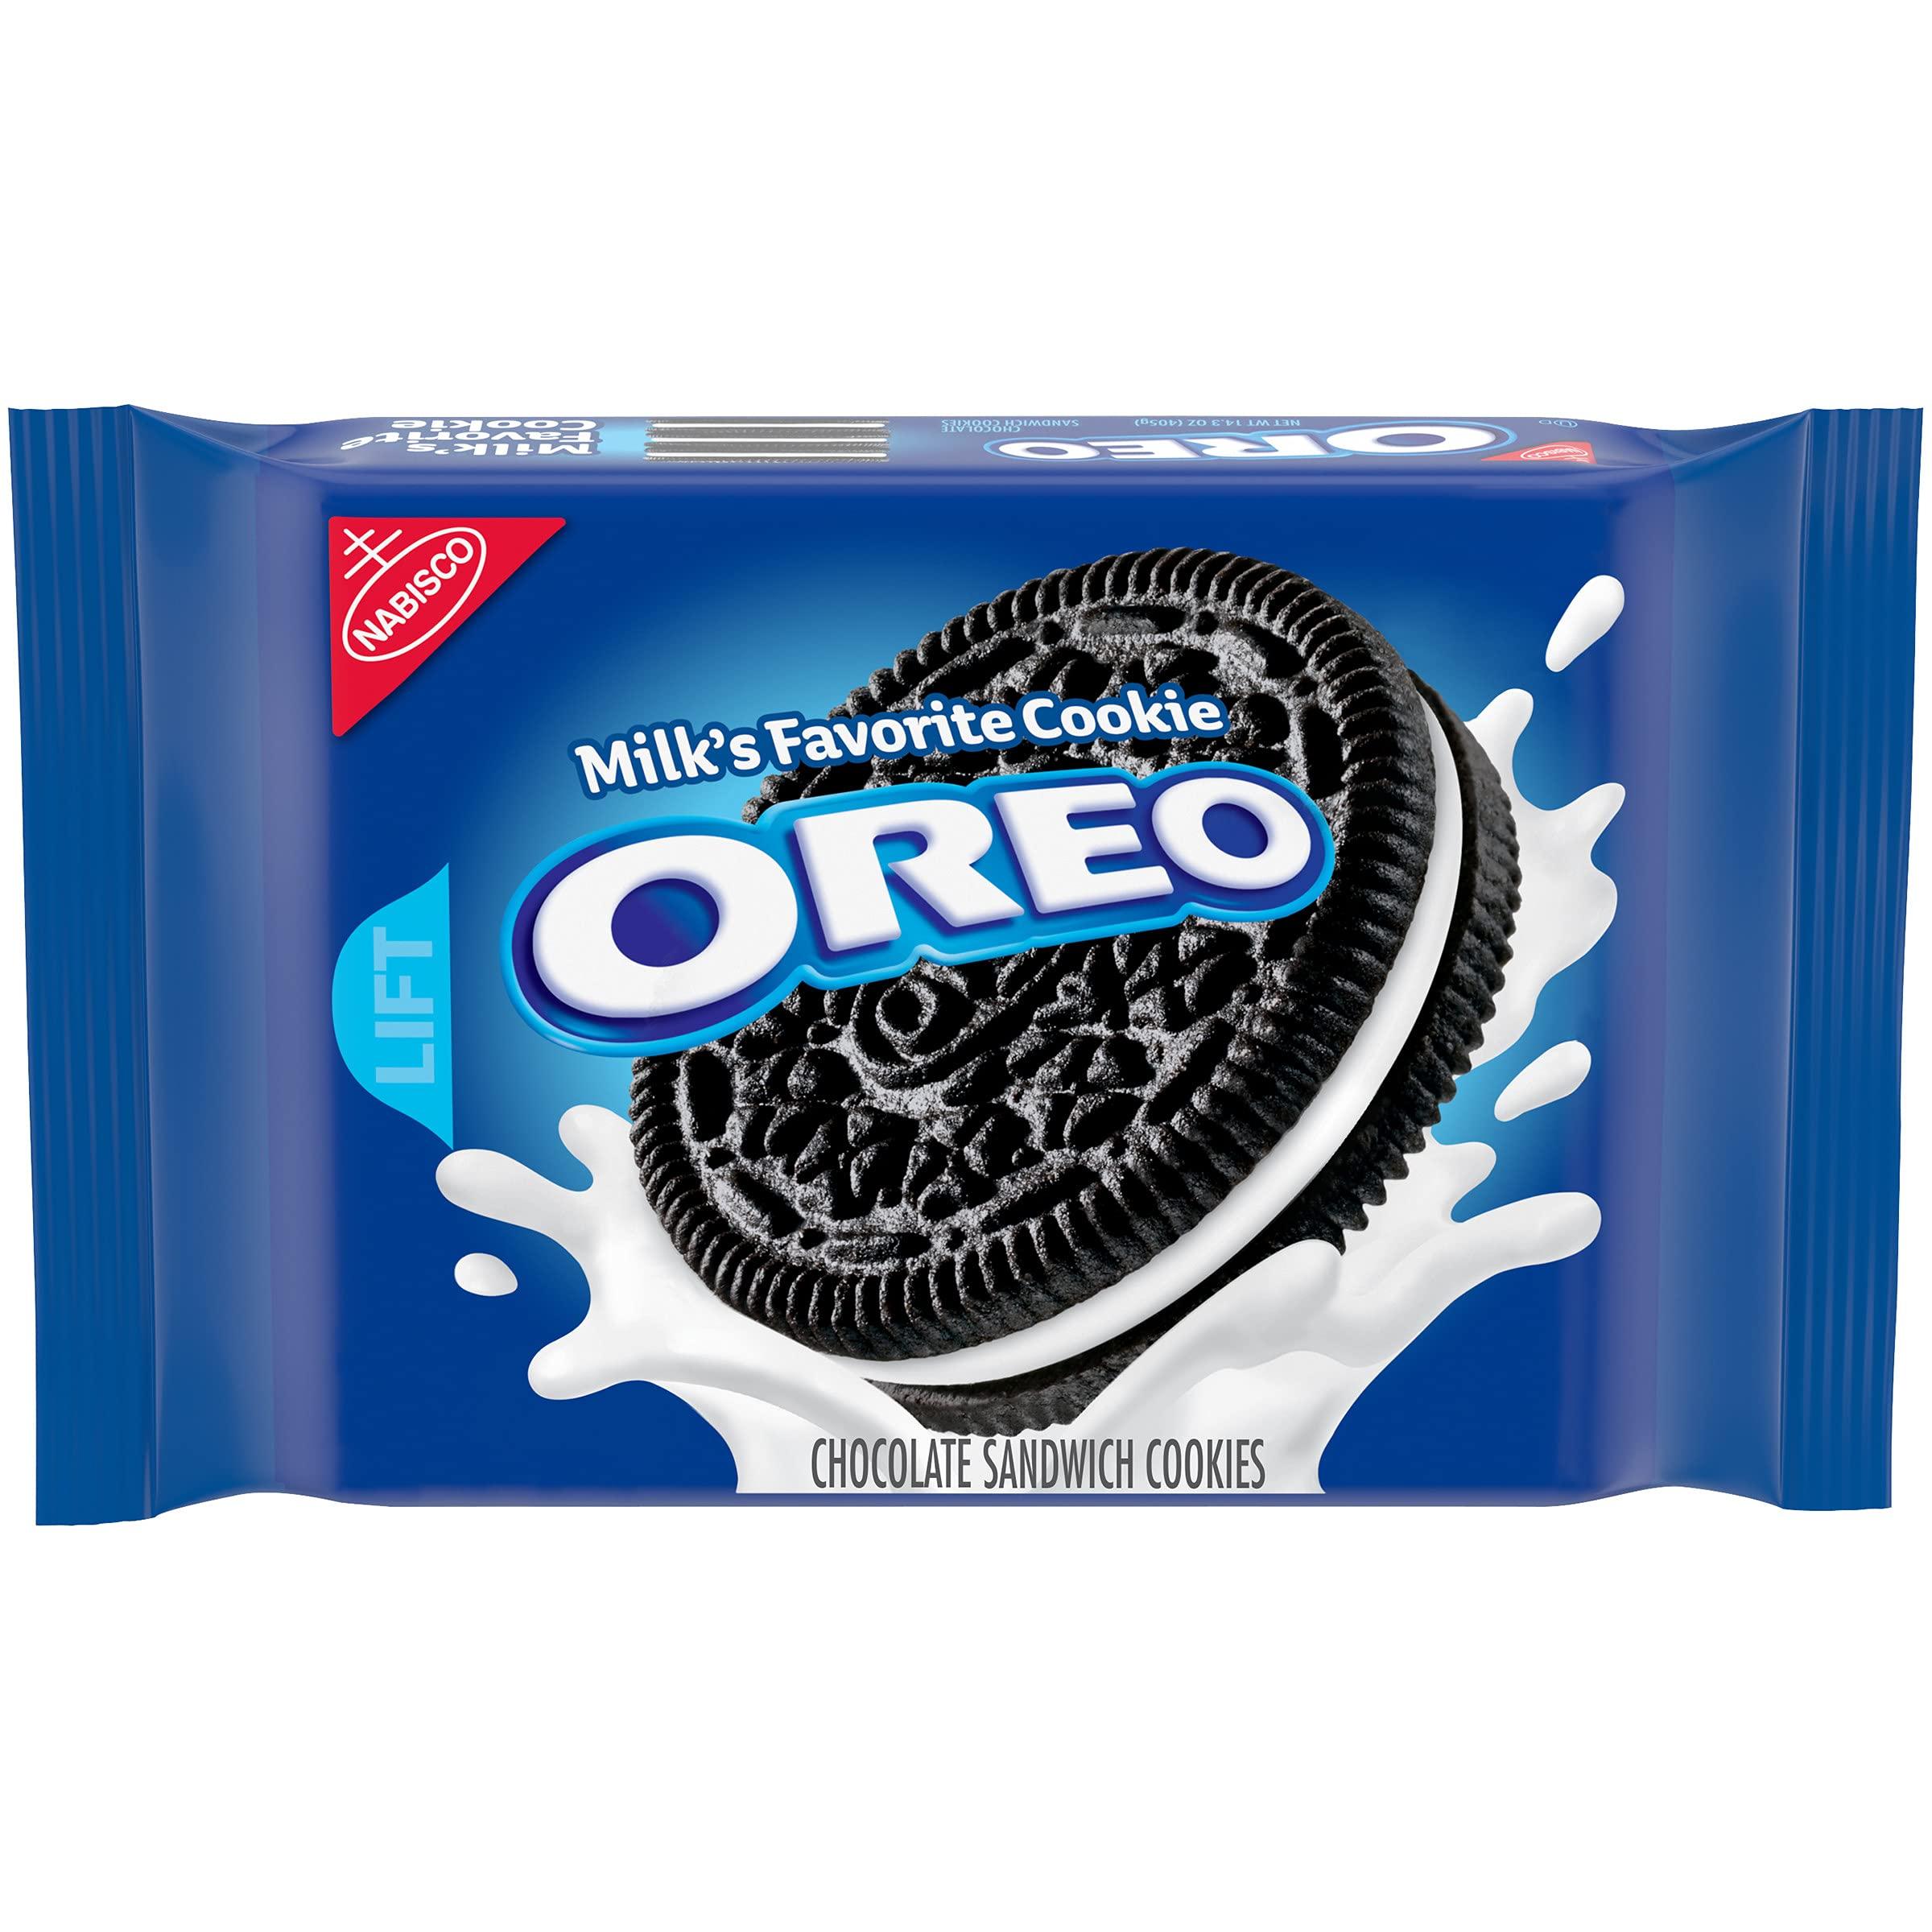 OREO Chocolate Sandwich Cookies, 14.3 oz